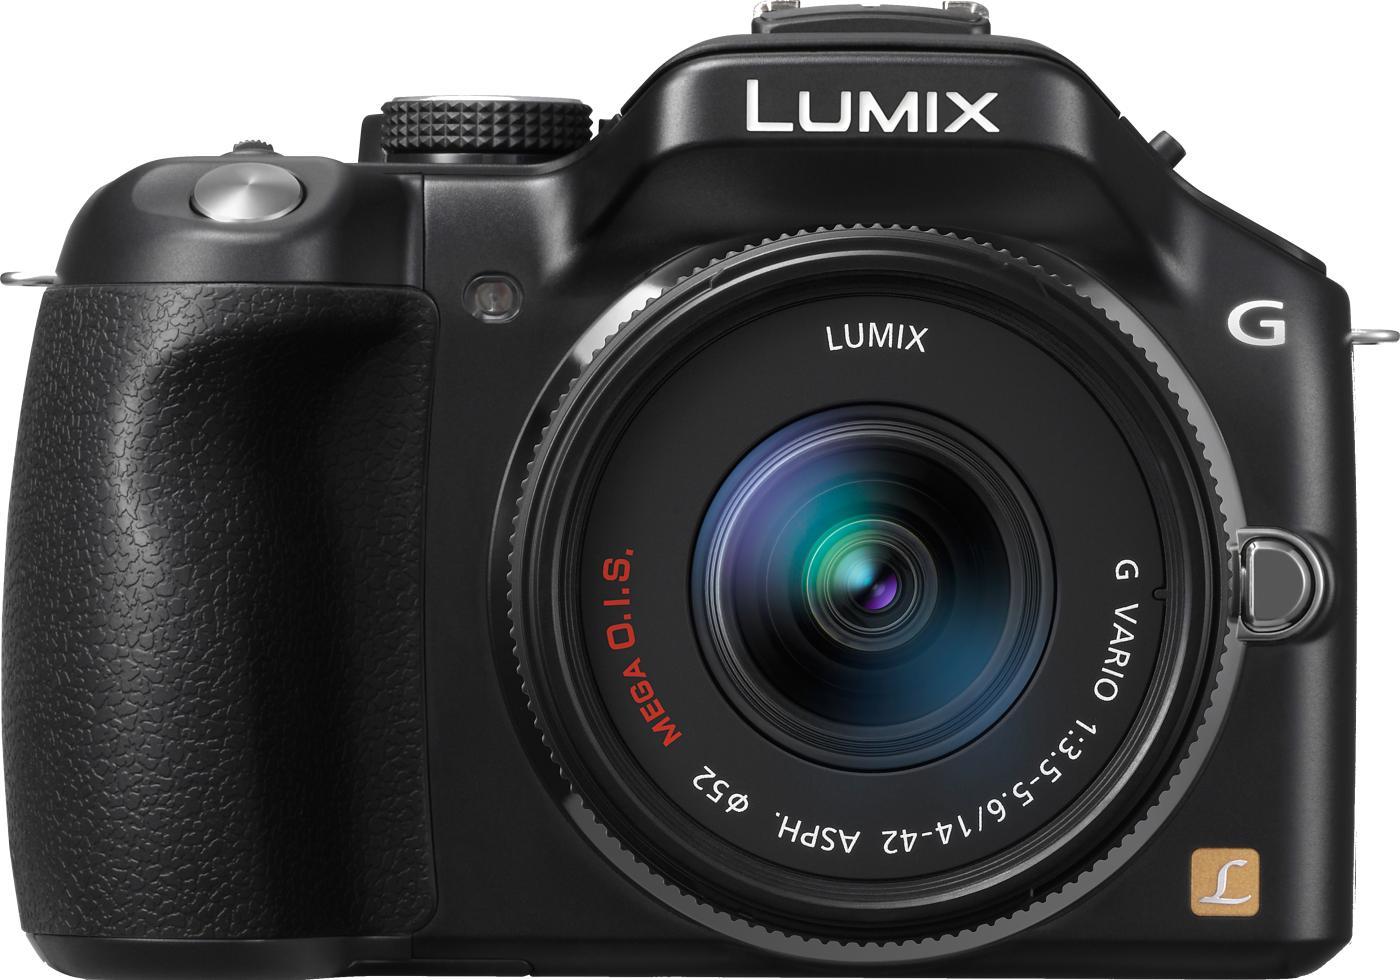 Panasonic Lumix DMC-G5 + Lumix G Vario 14-42mm/ F3.5-5.6 ASPH./ MEGA O.I.S